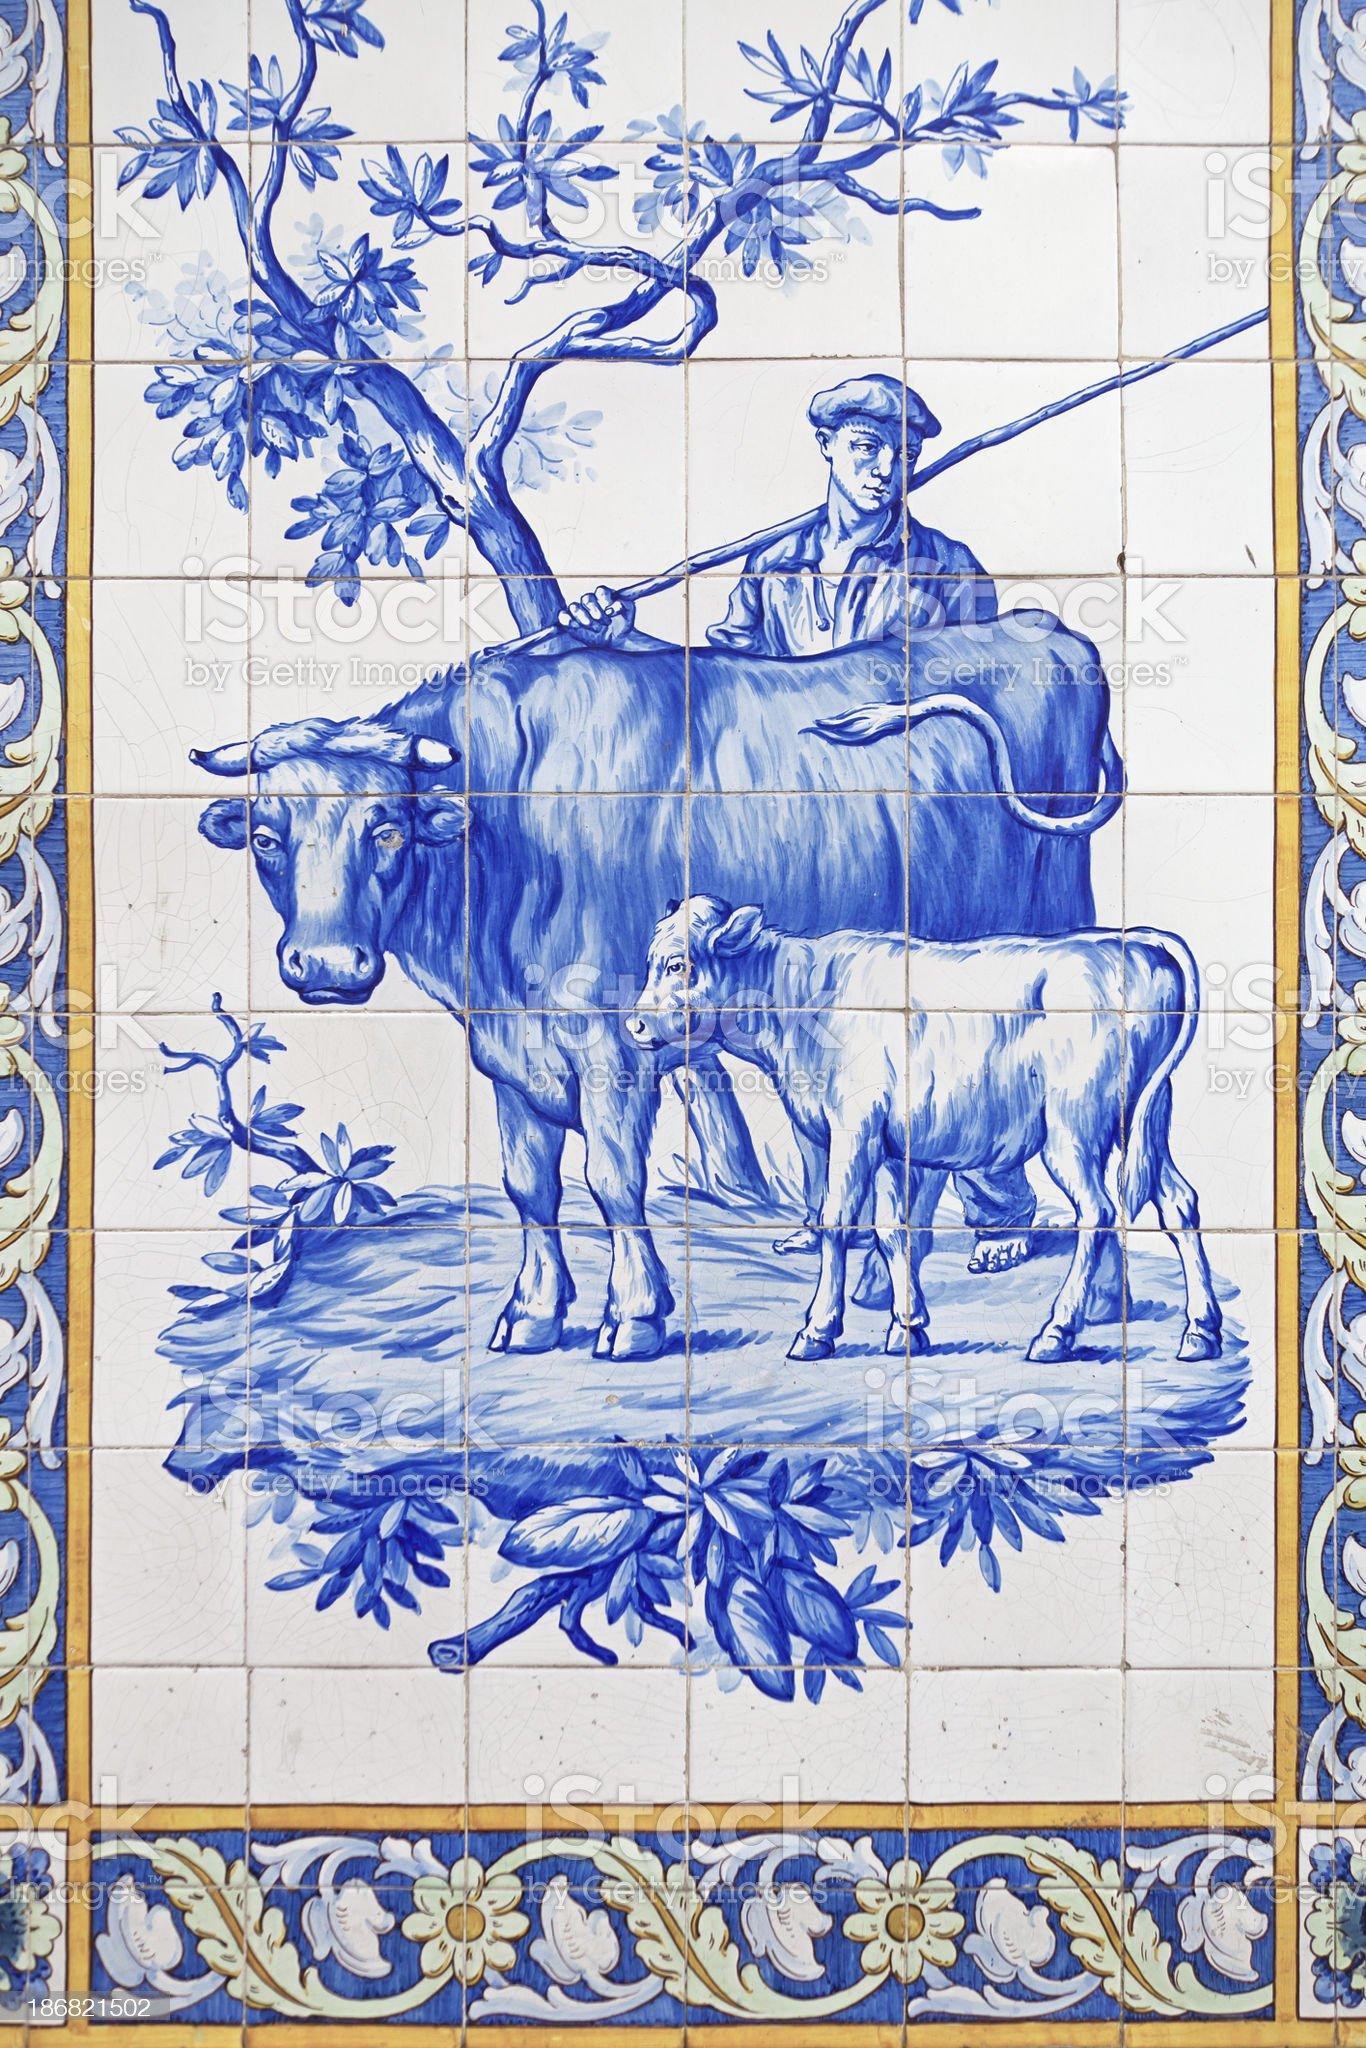 Antique tile mosaic royalty-free stock photo